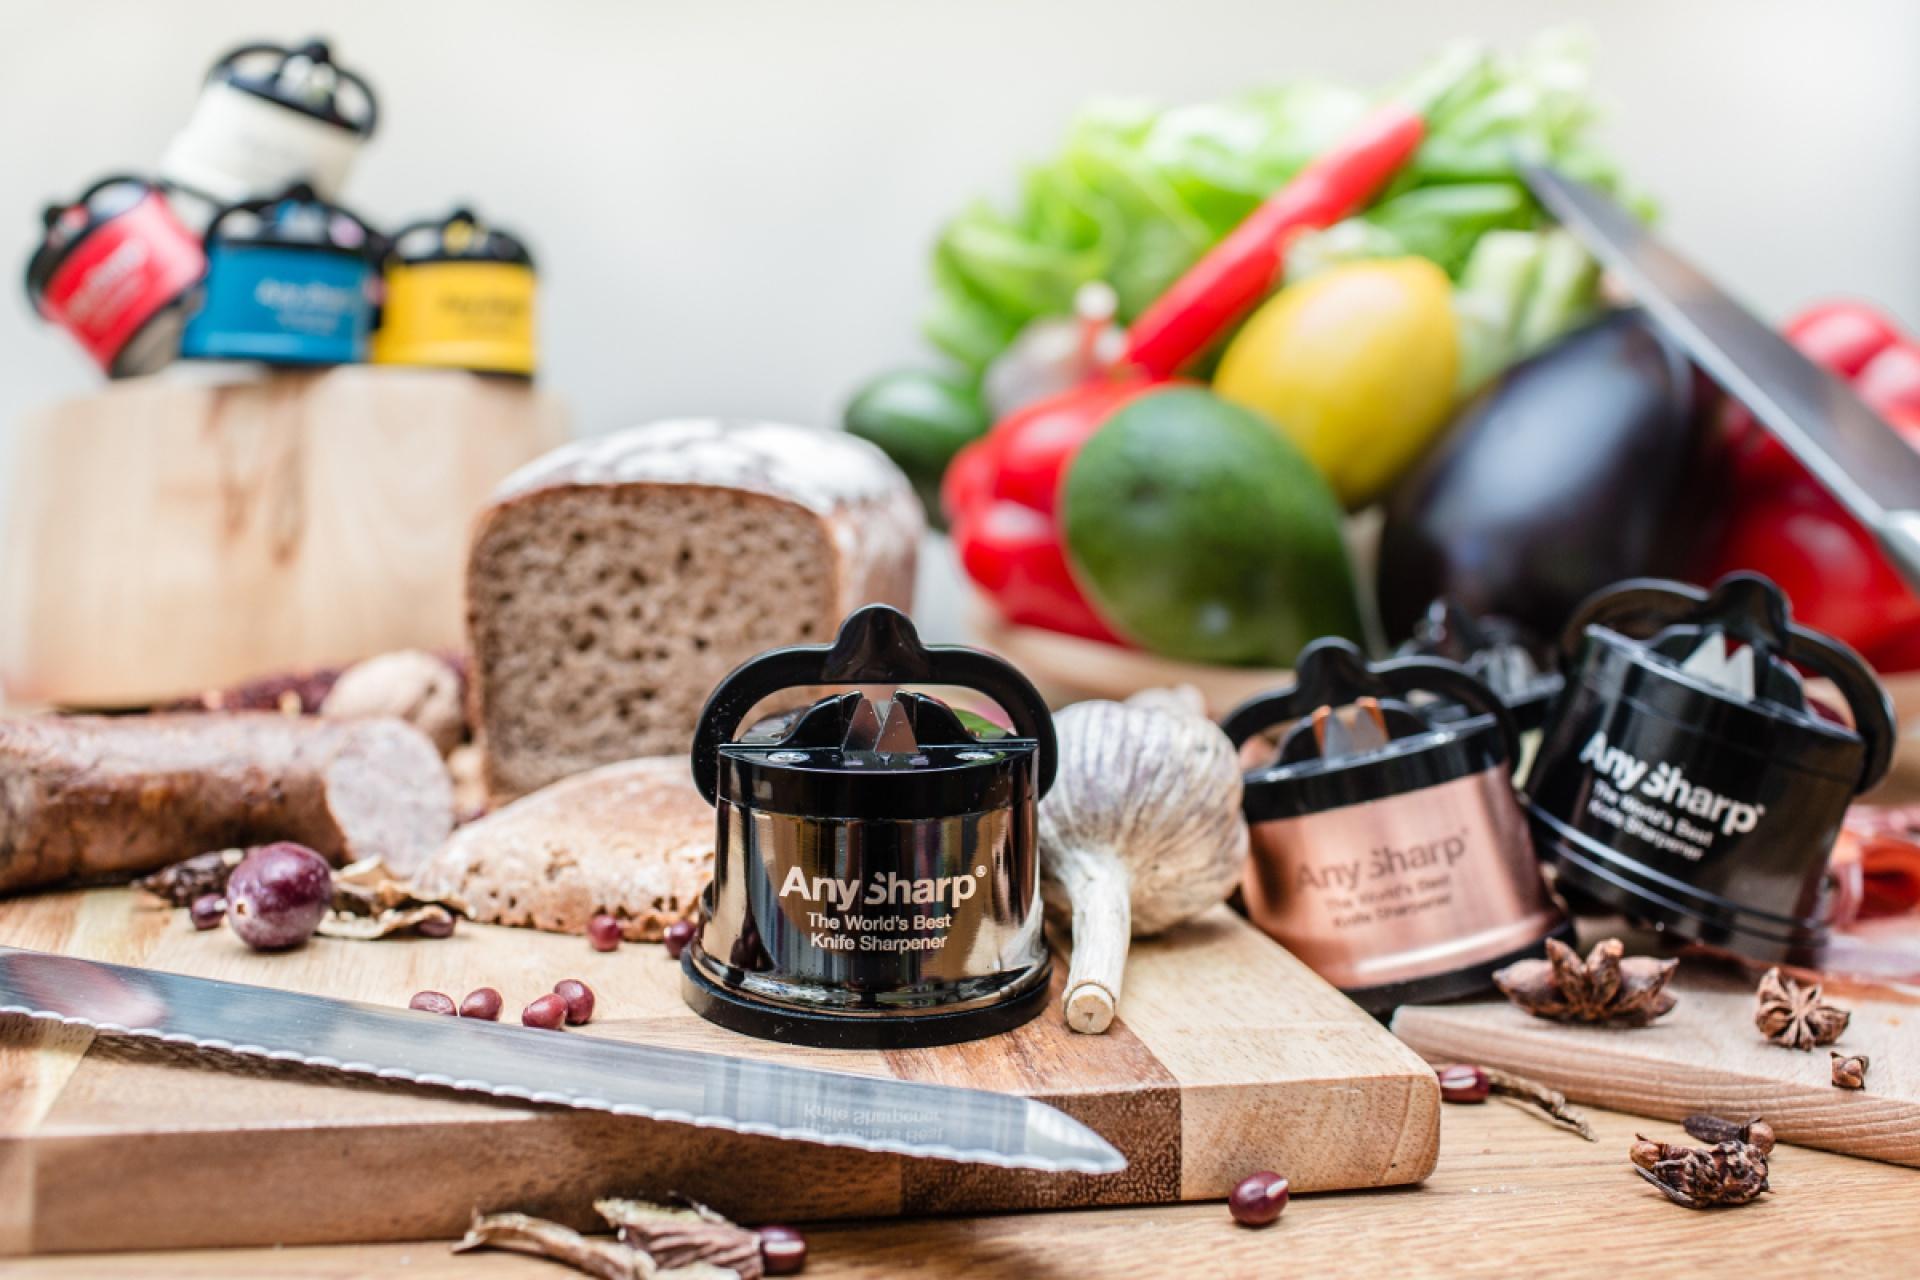 Ostrzałka AnySharp® PRO Chef w kuchni